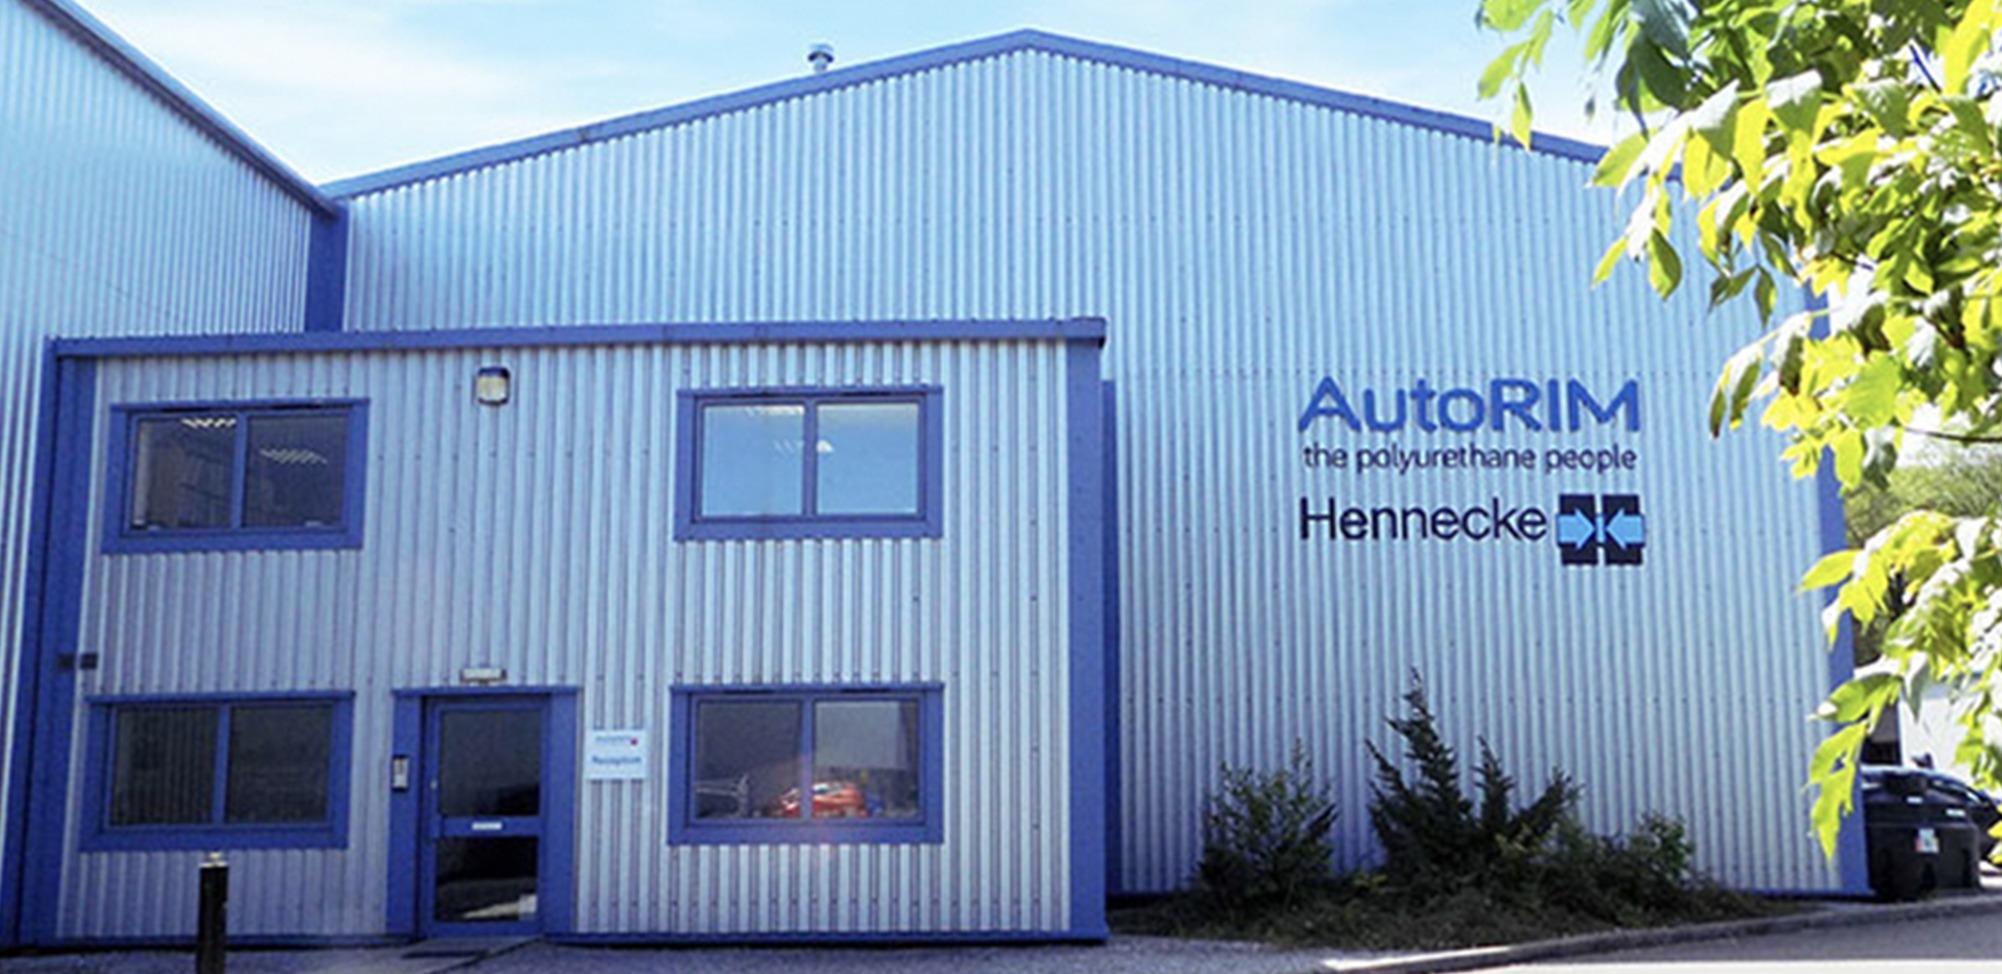 AutoRIM Offices